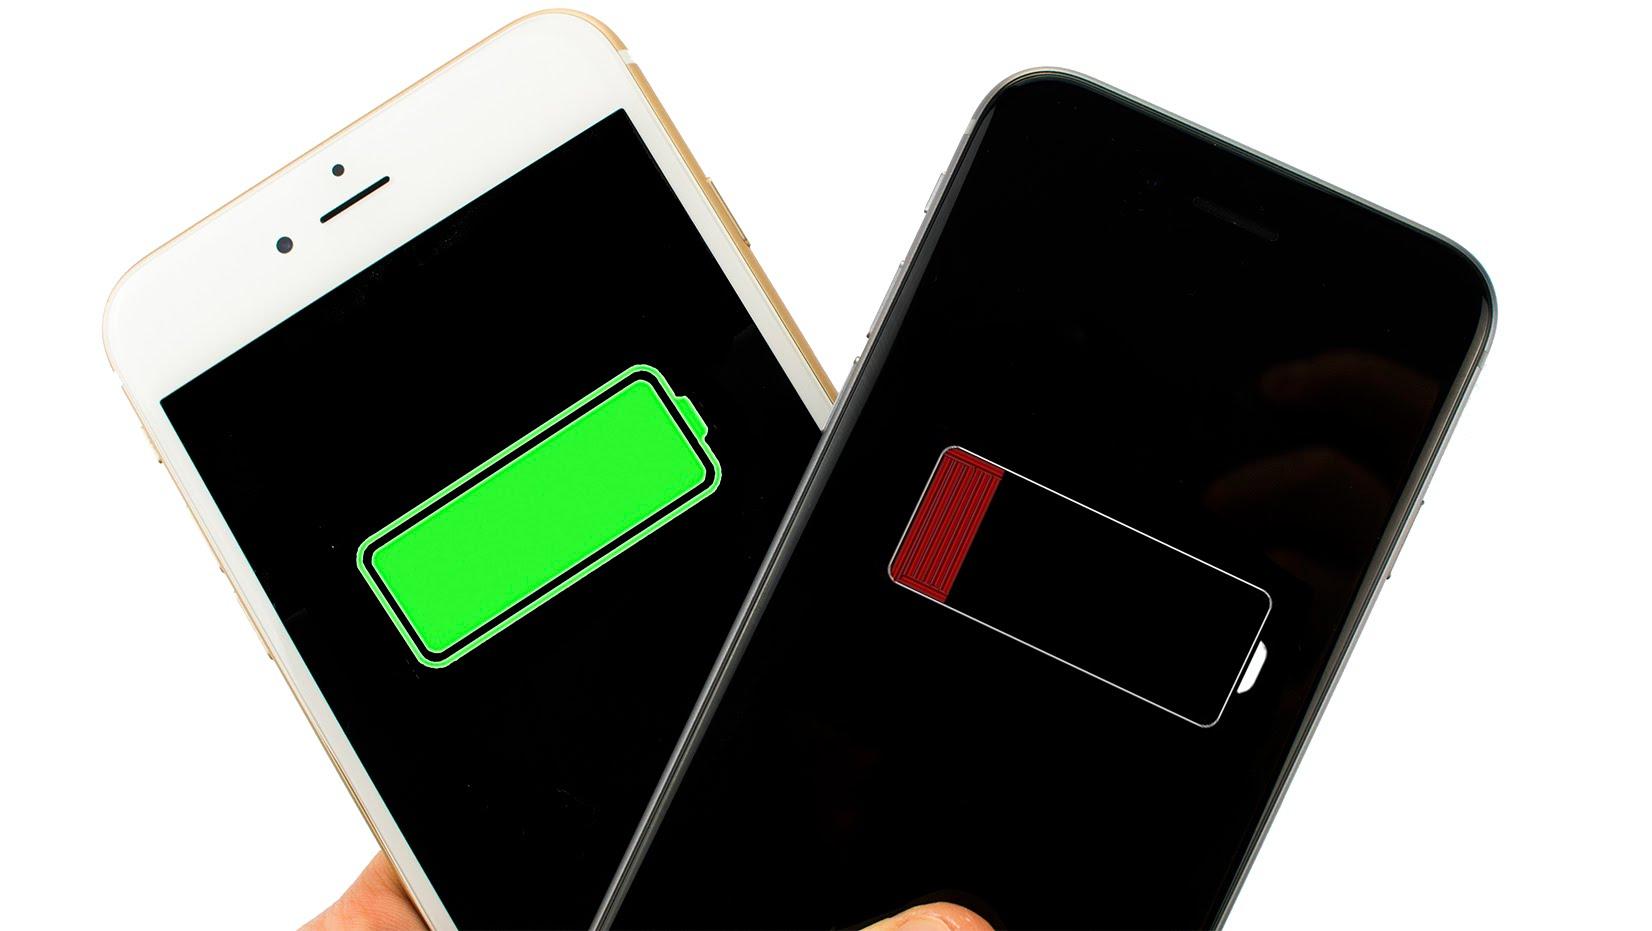 Batería de iphone